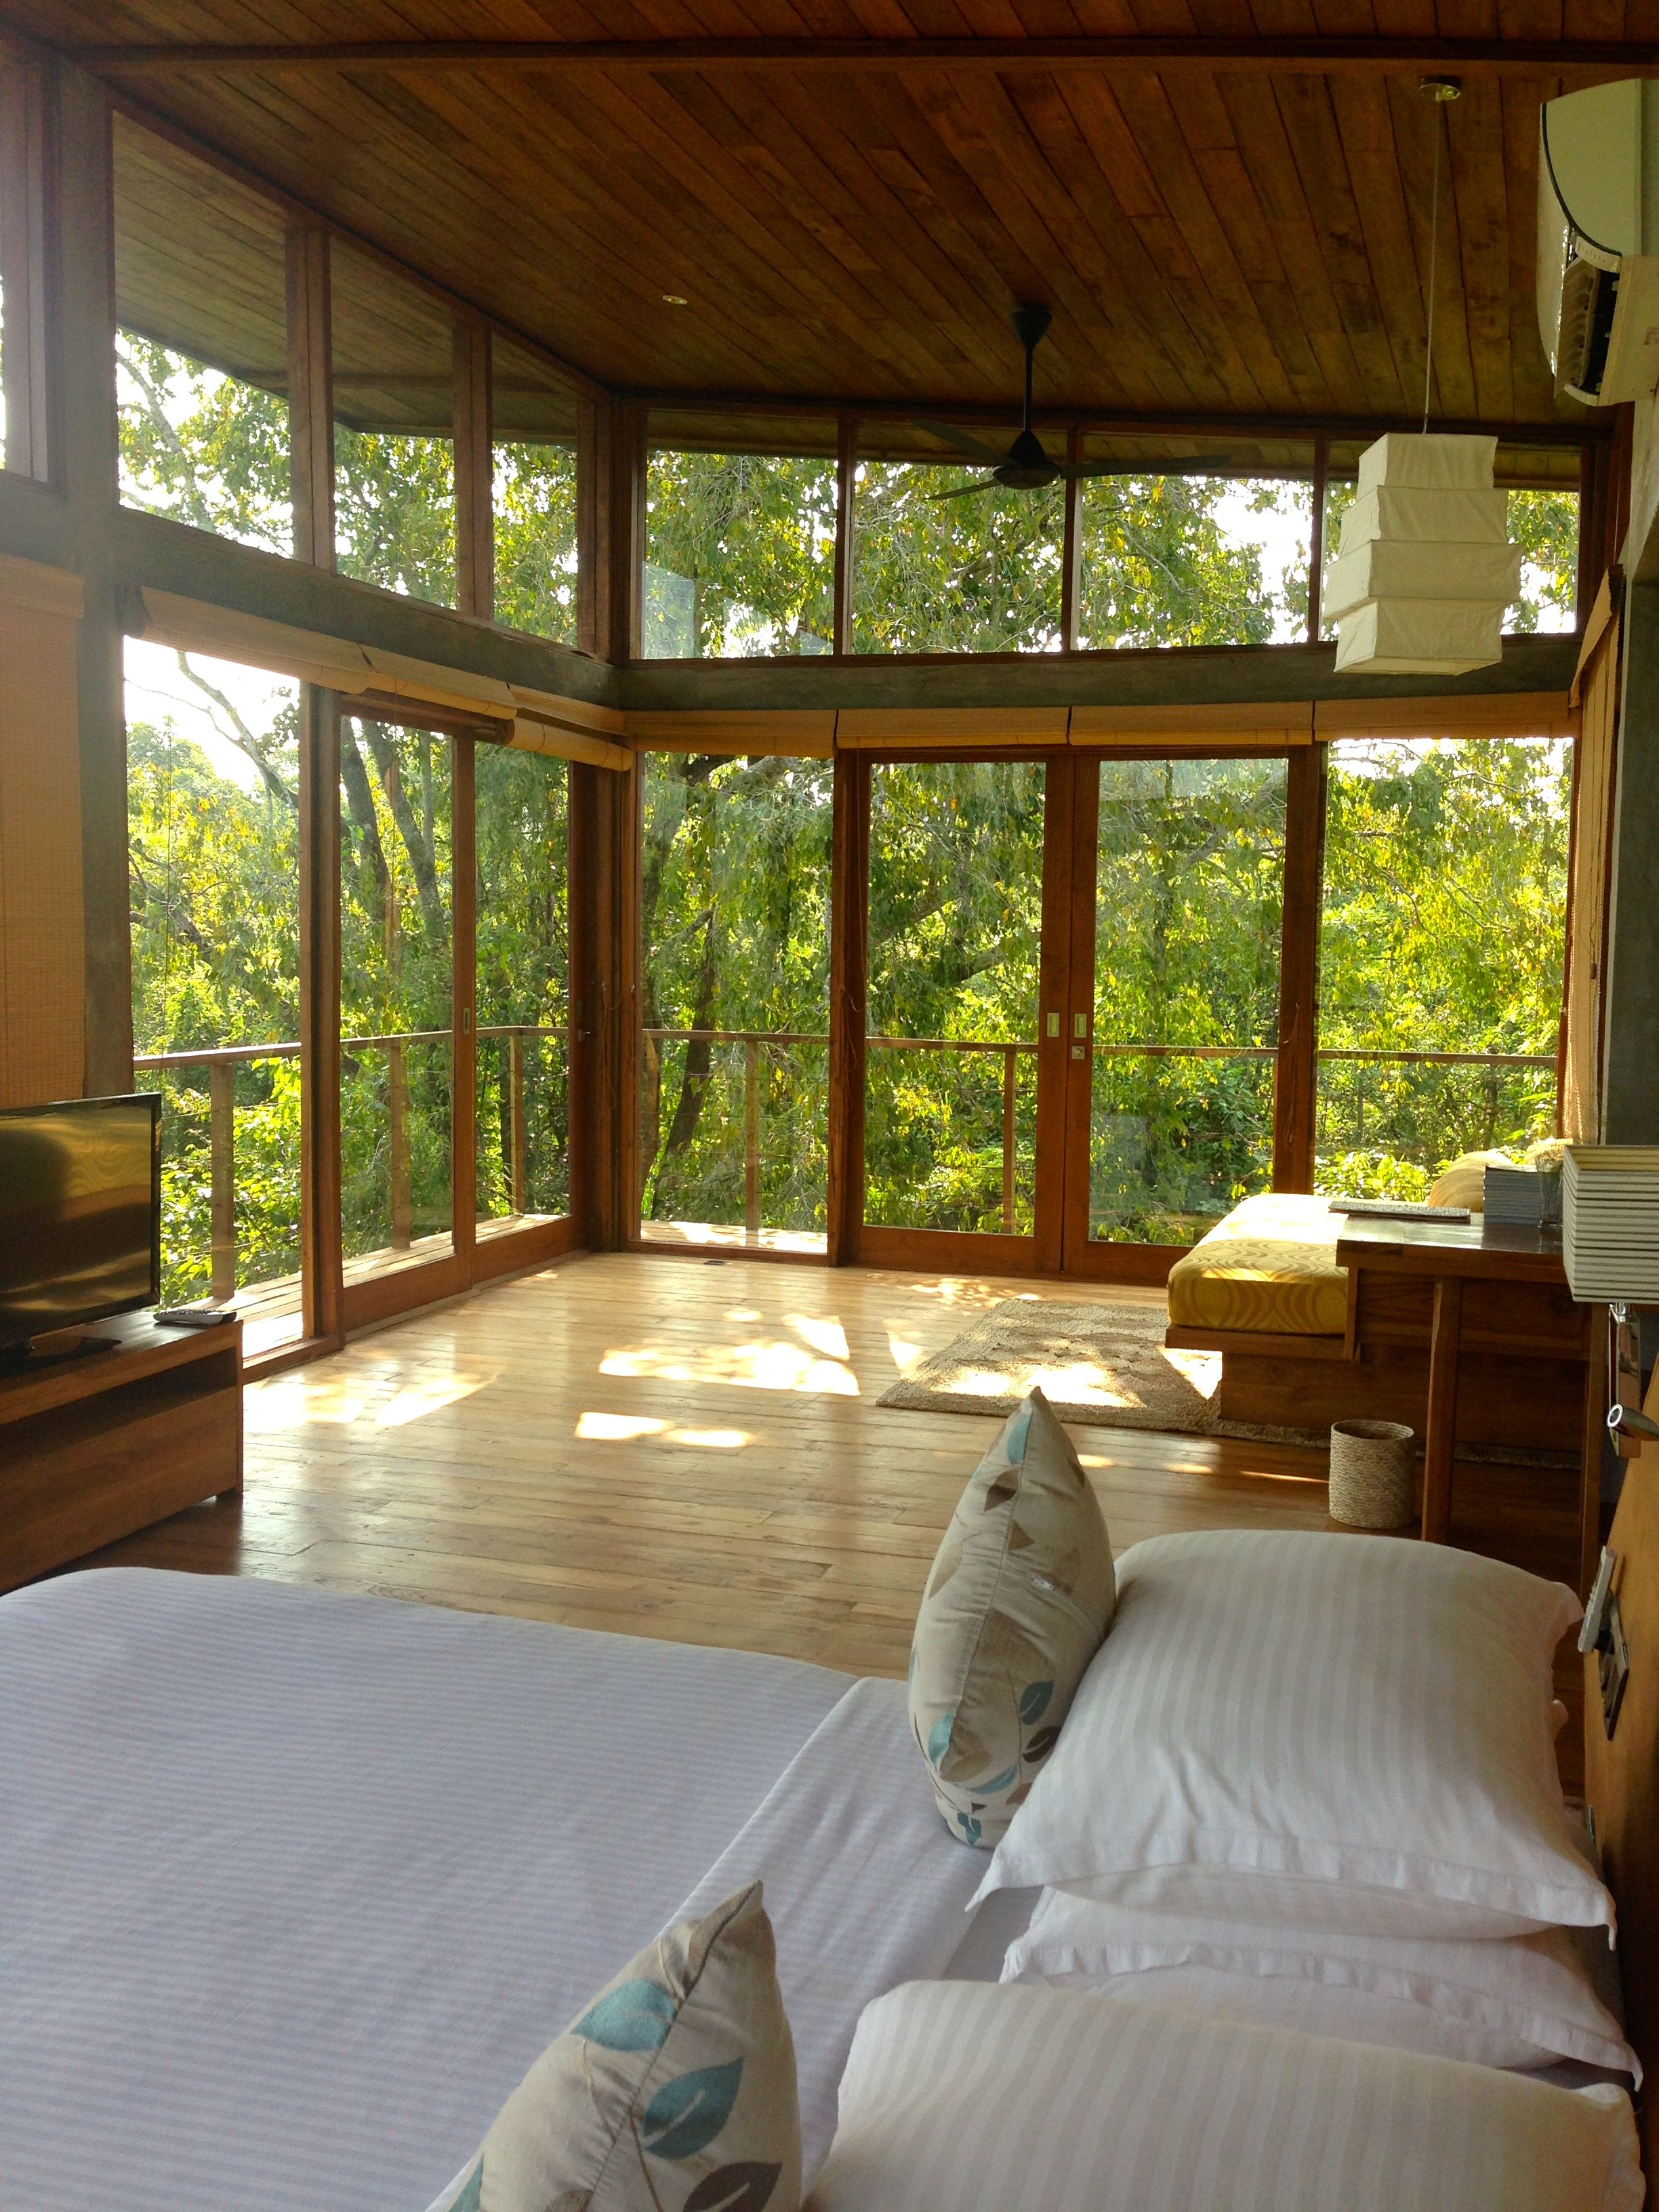 Wild Grass Nature Resort Sigiriya Sri Lanka Ideas For The House In